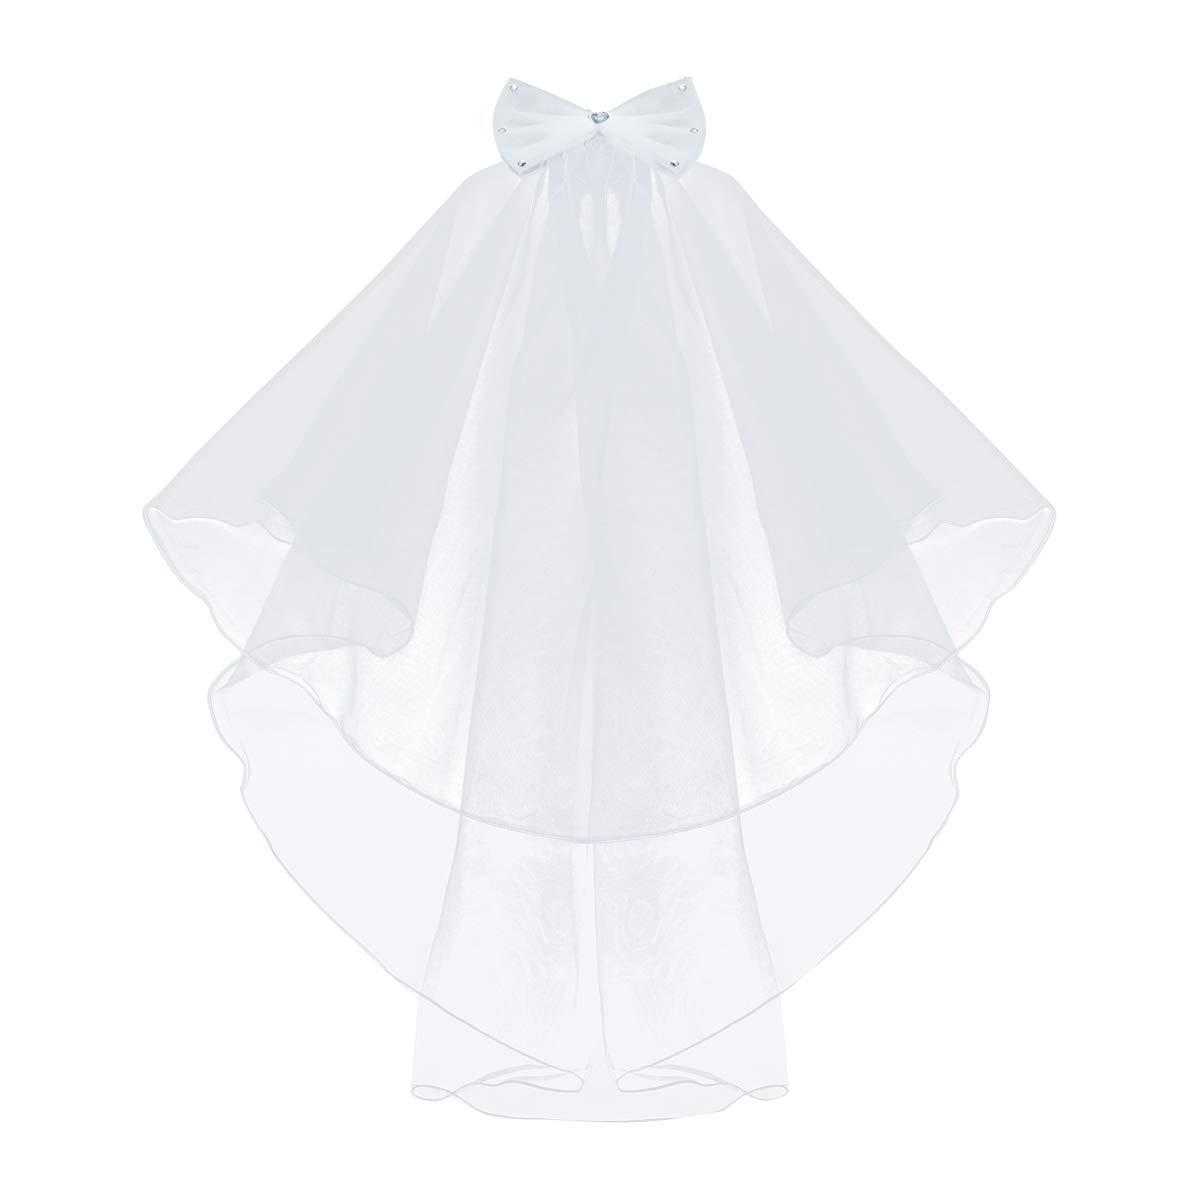 Freebily Flower Girls White Catholic Religious First Communion Veil Headband with Bow Type A One Size